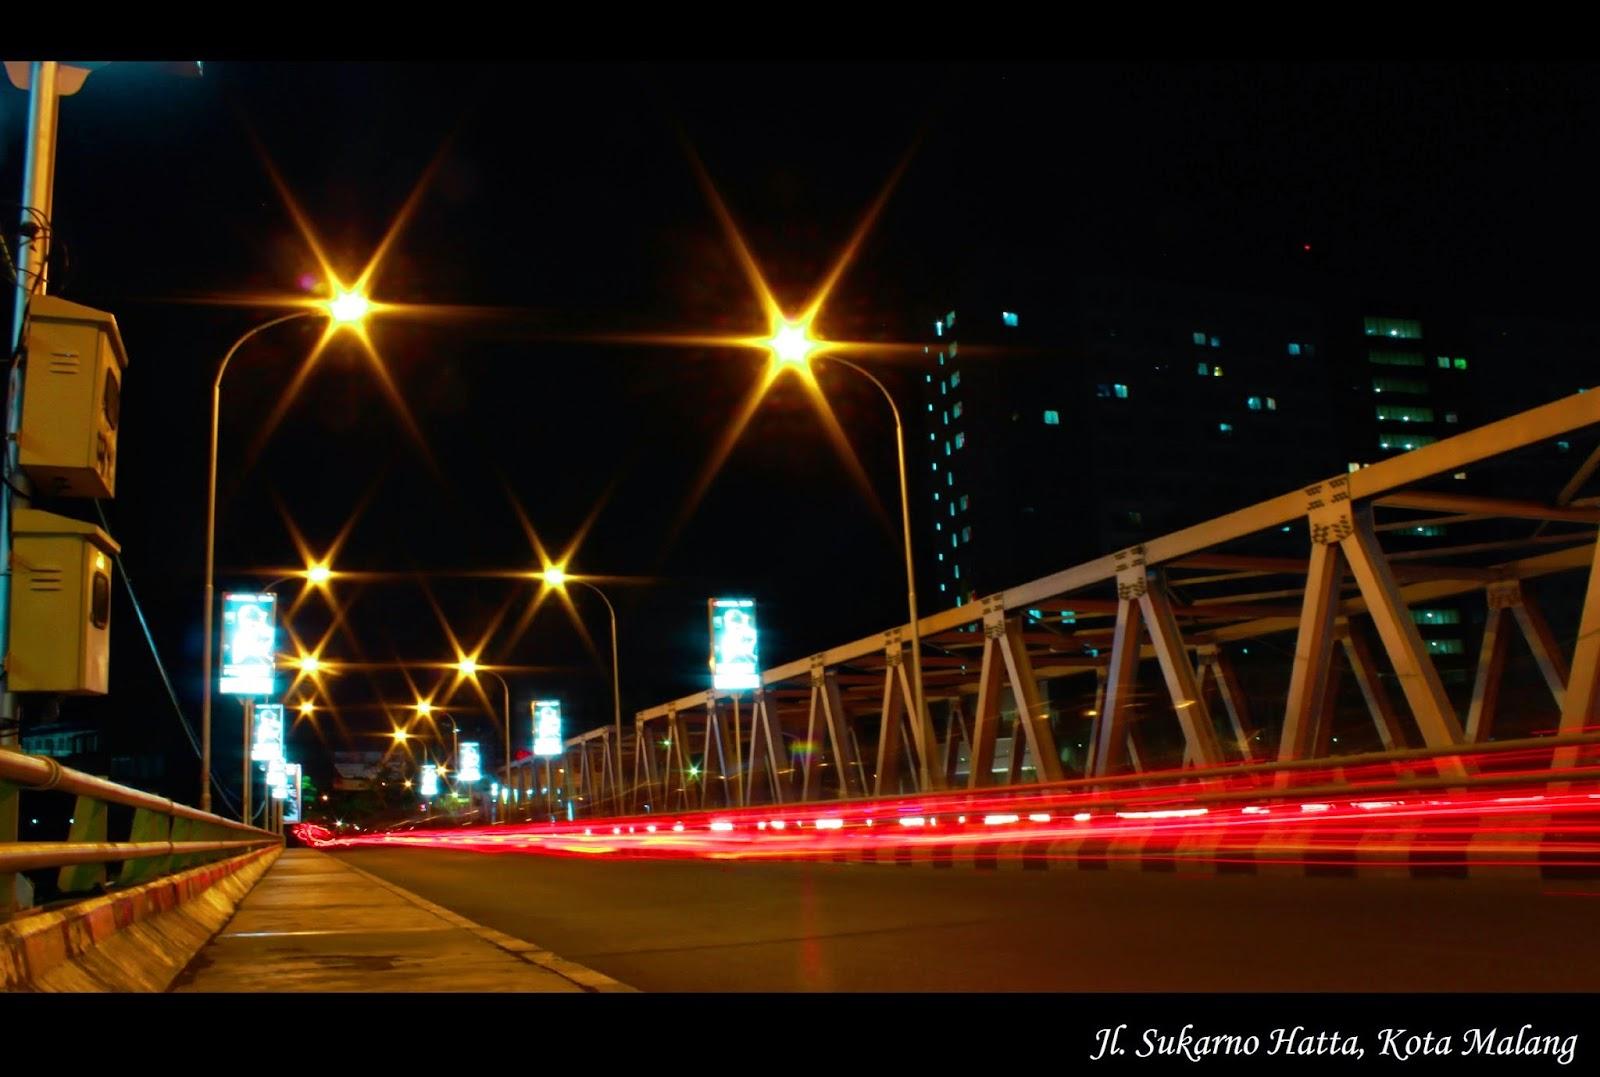 Foto Malam Night Shoot Jembatan Sukarno Hatta Kota Malang